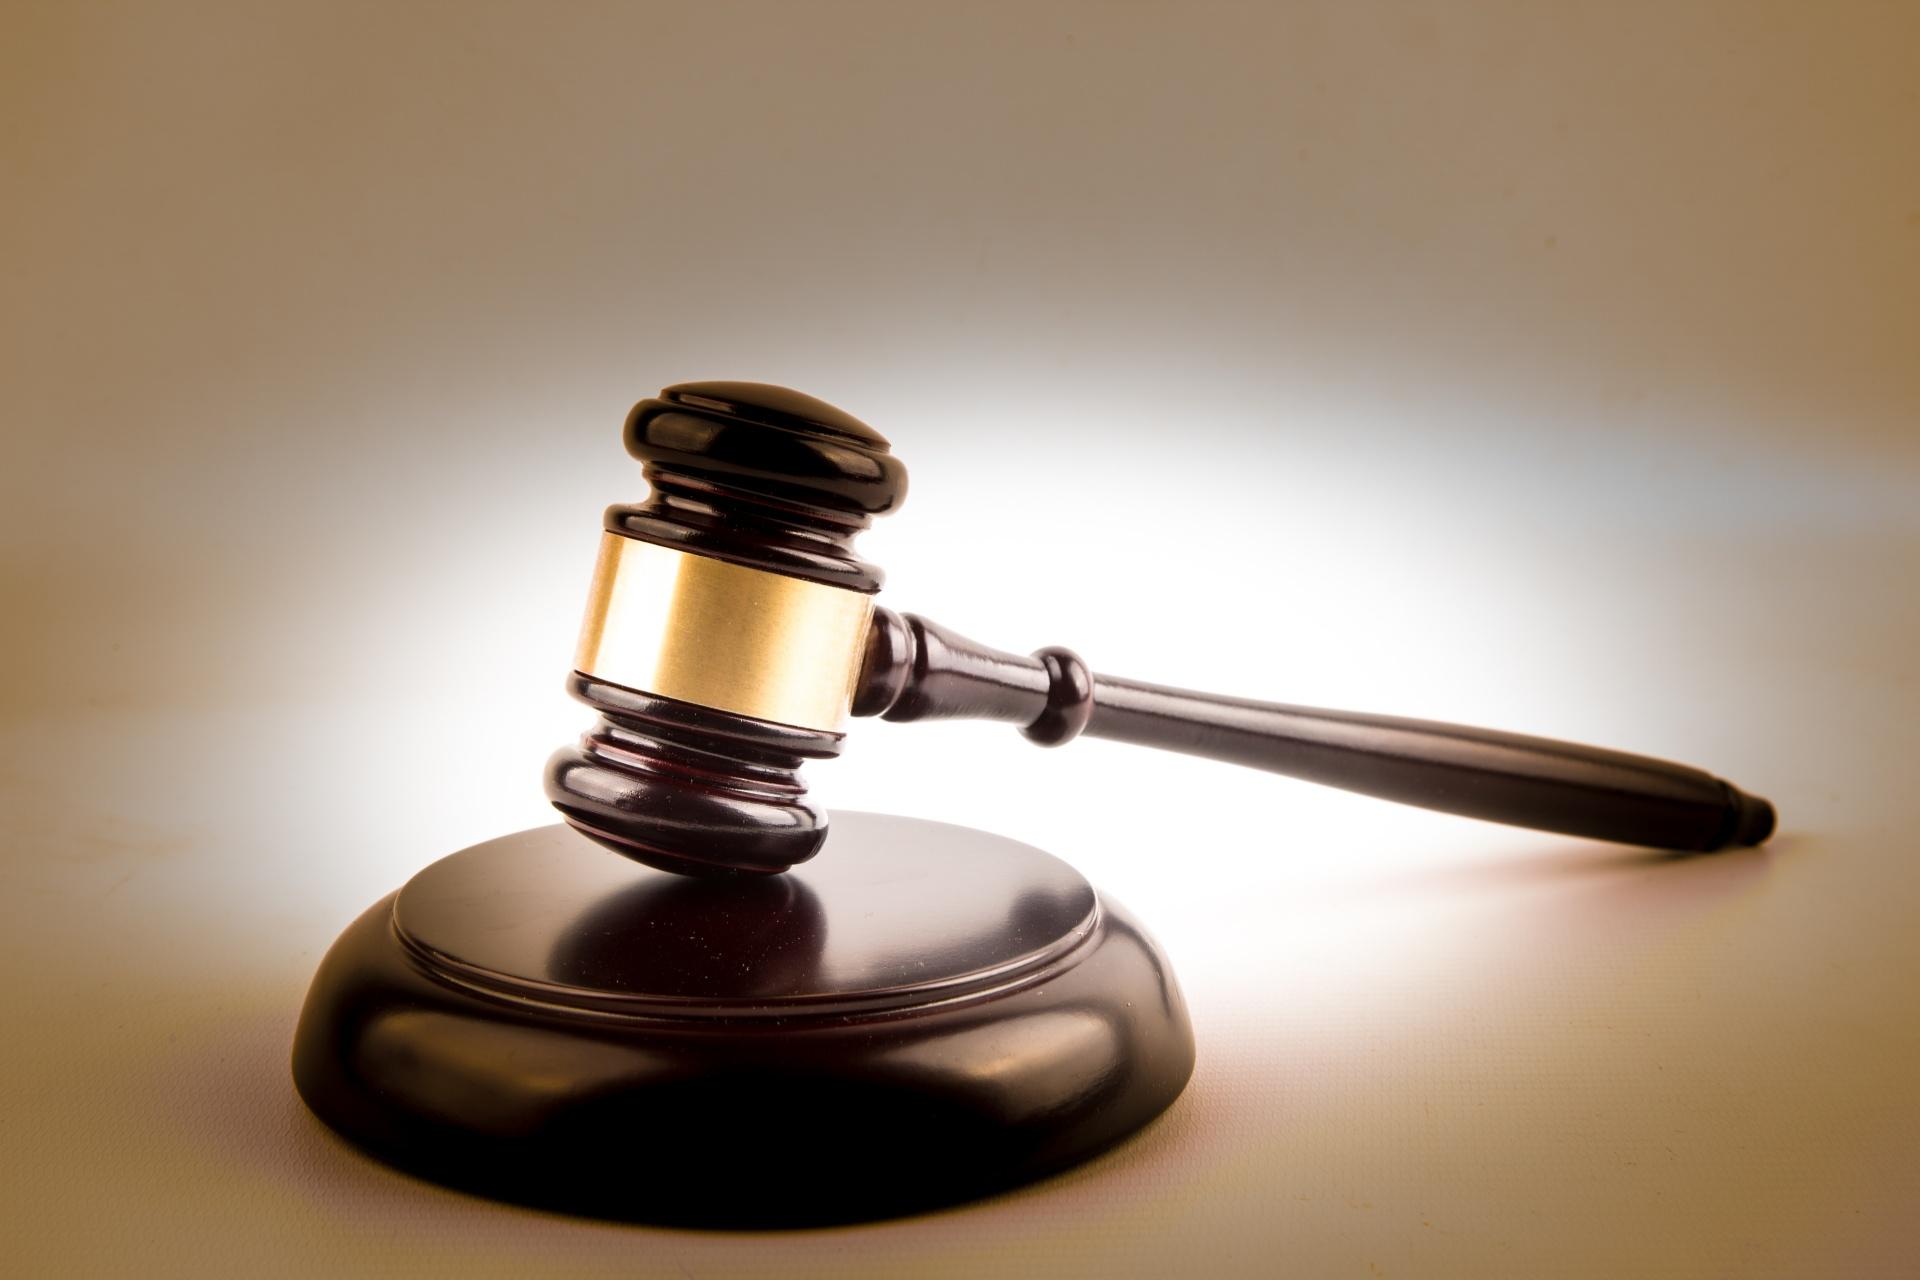 Mt. Vernon Man Sentenced 20 Years on Meth Charge